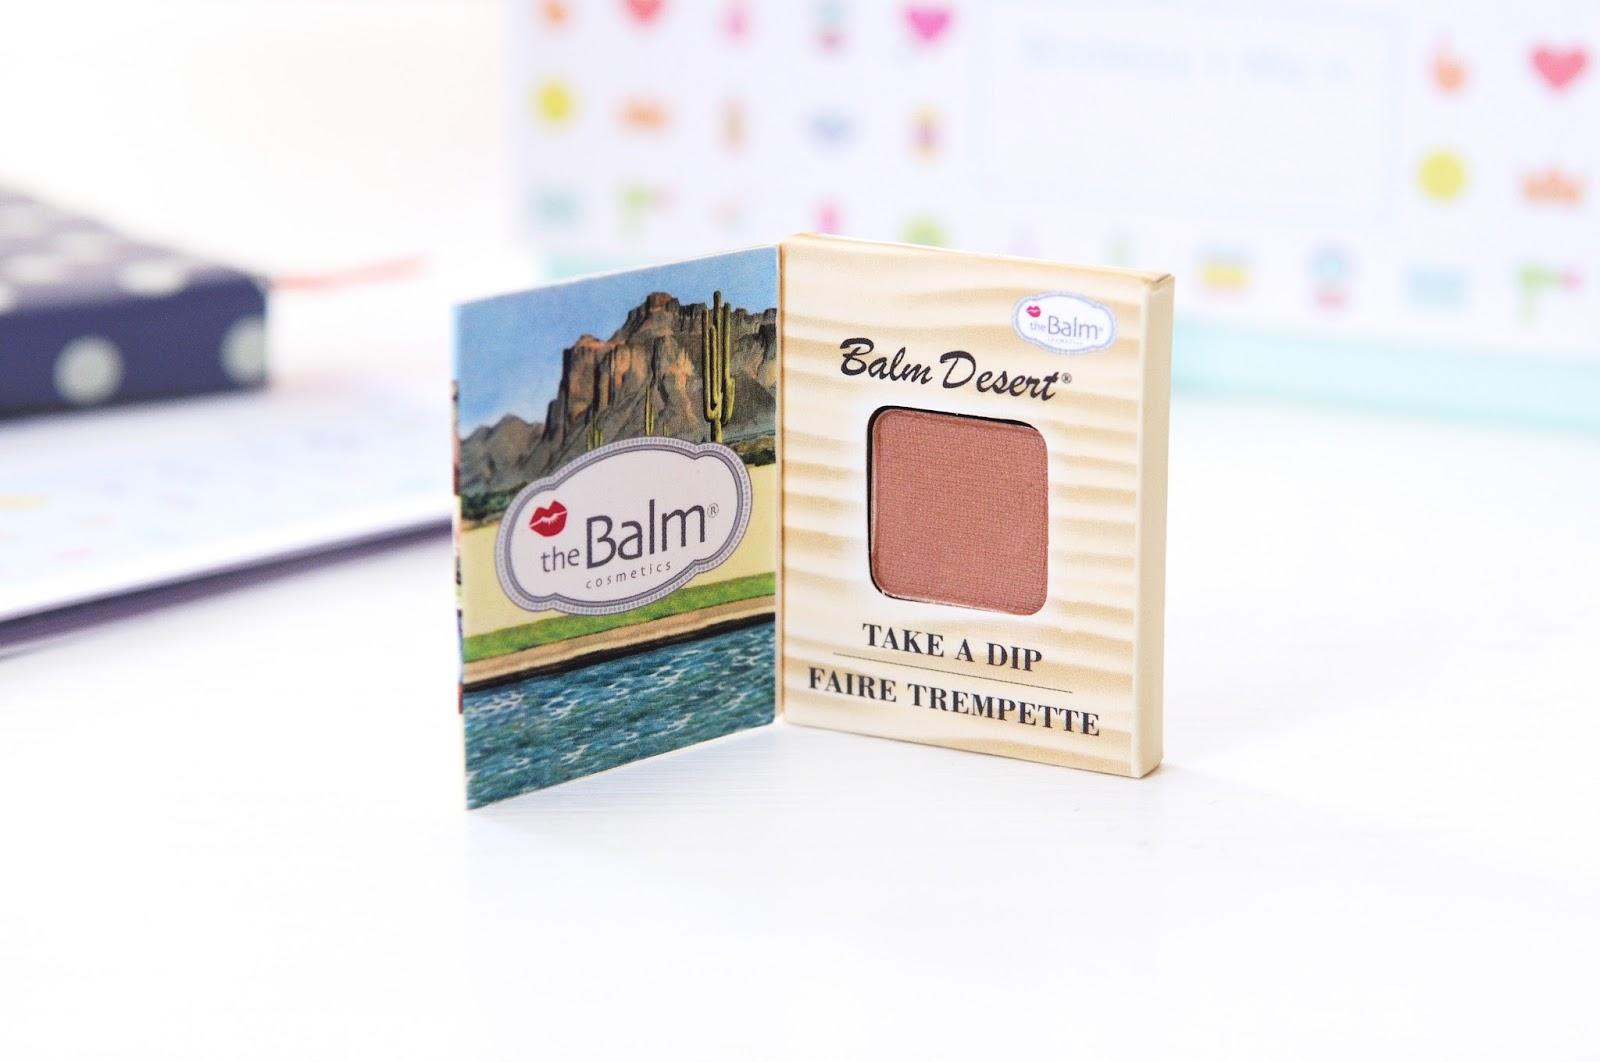 theBalm Balm Desert